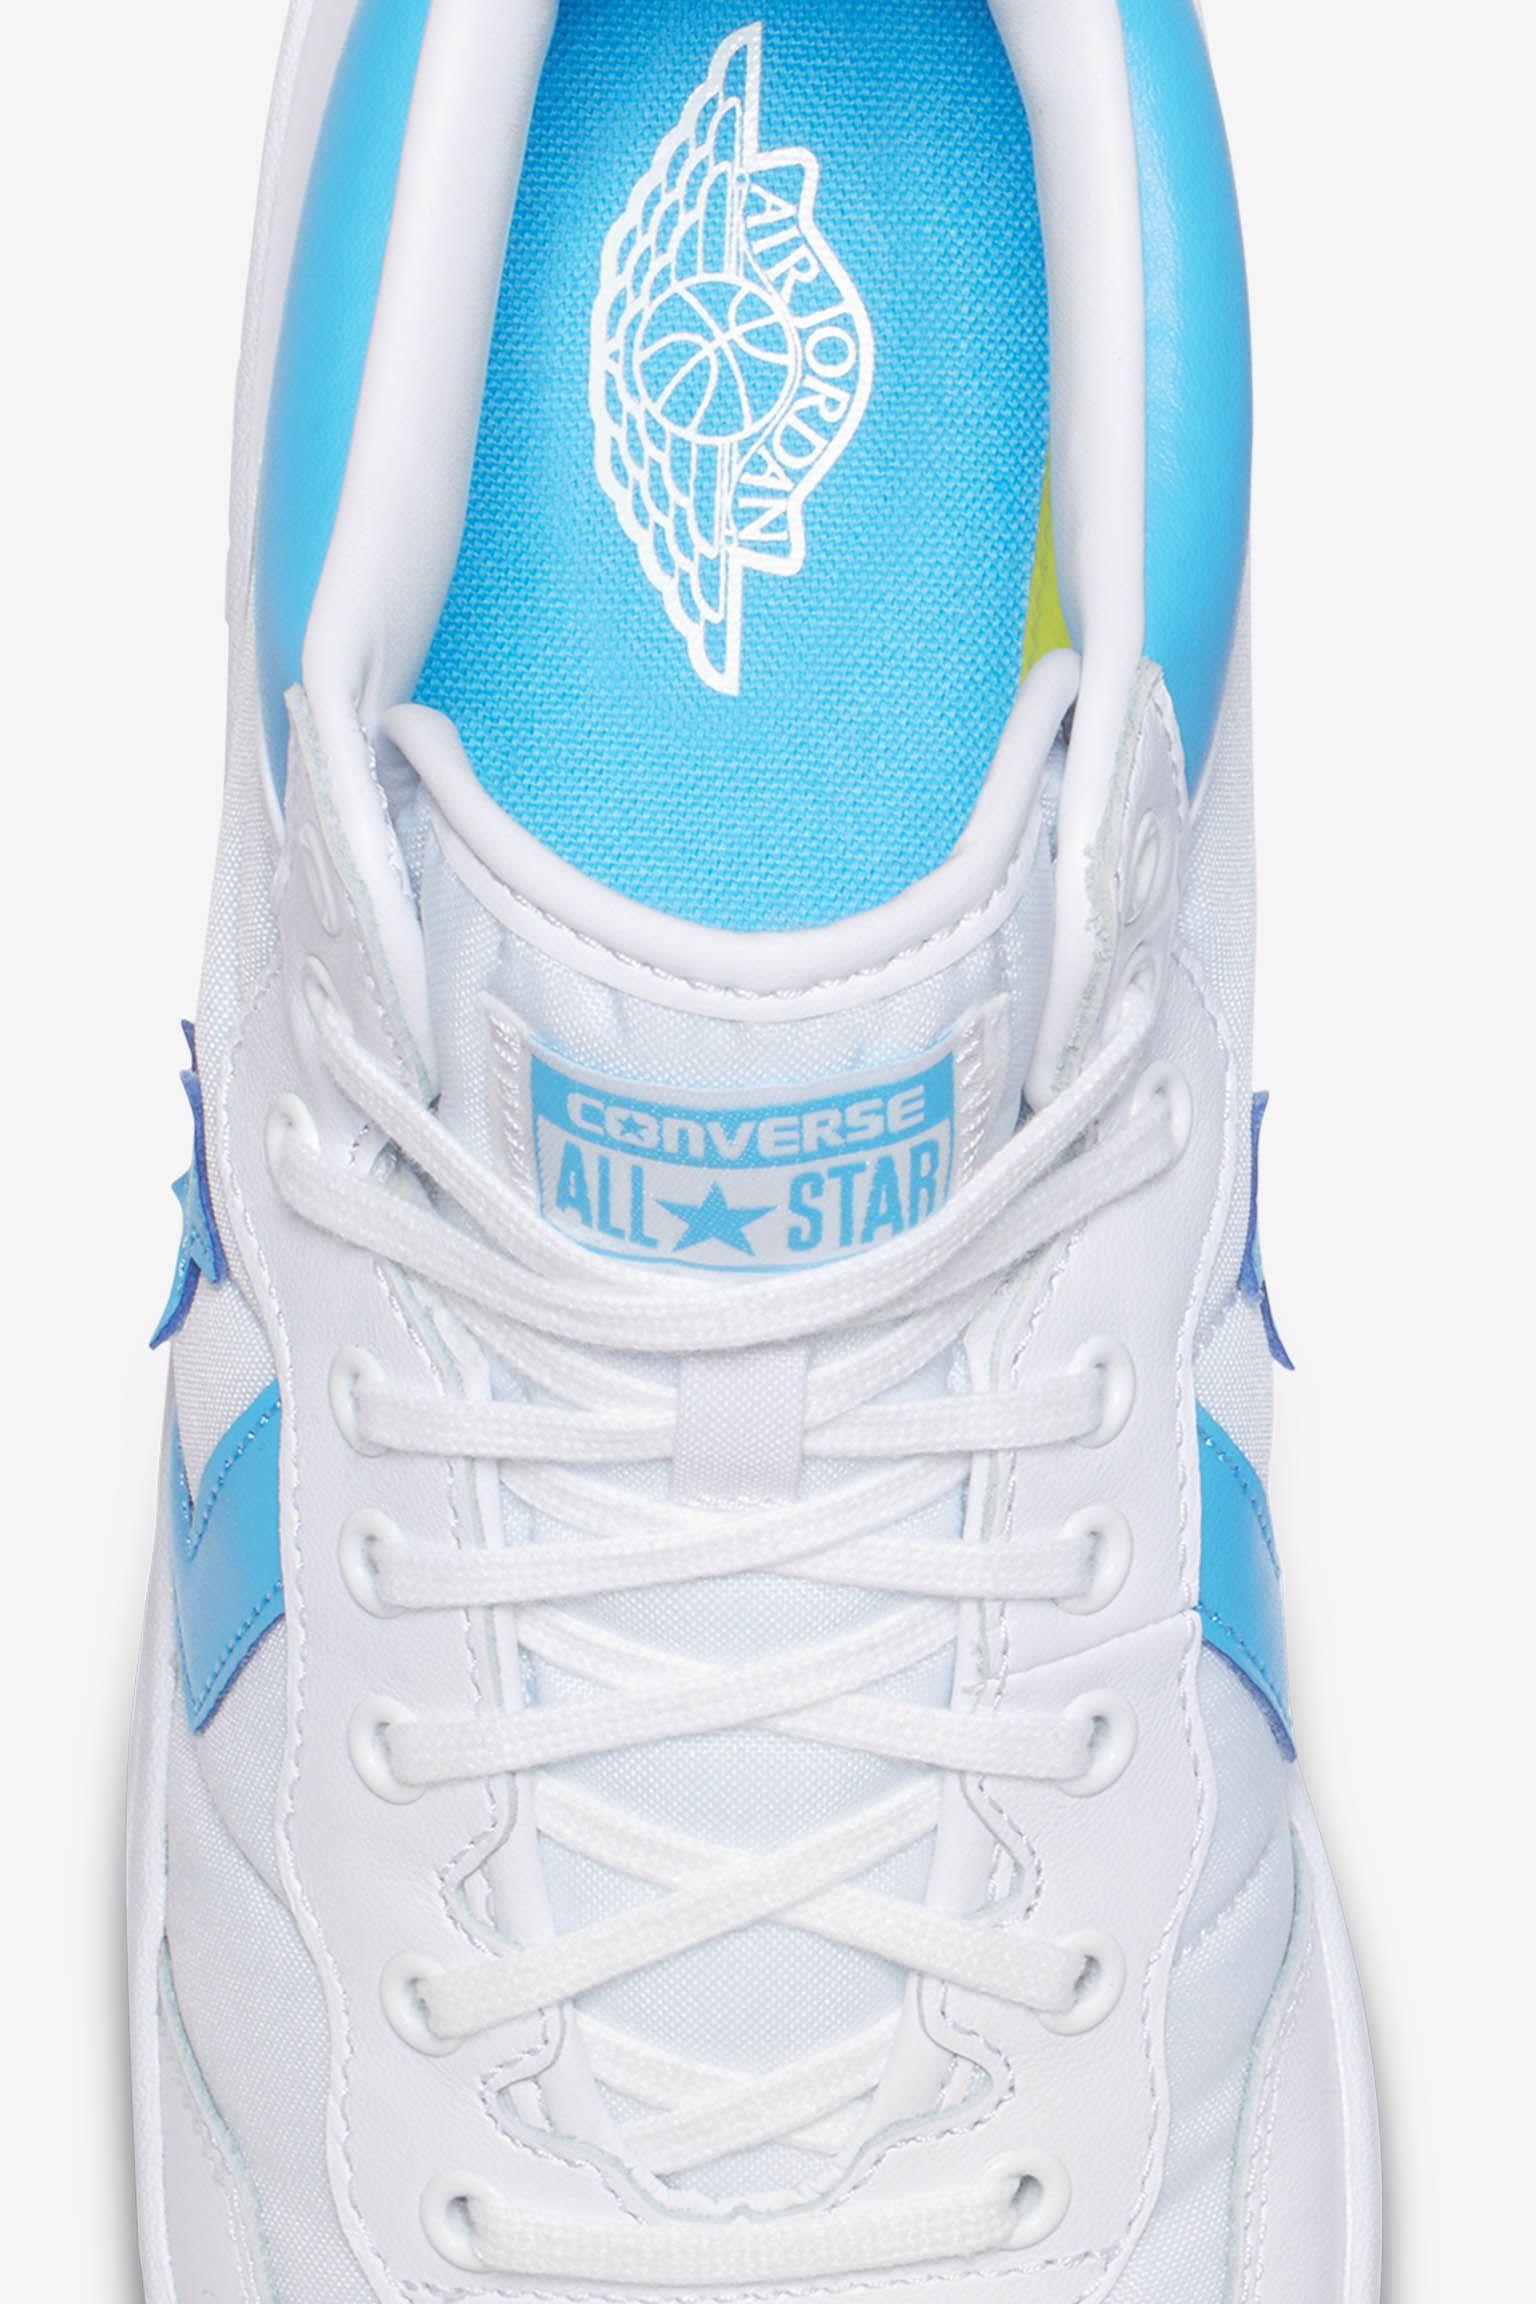 Air Jordan x Converse Pack 2017 Release Date. Nike+ SNKRS 5226677e1